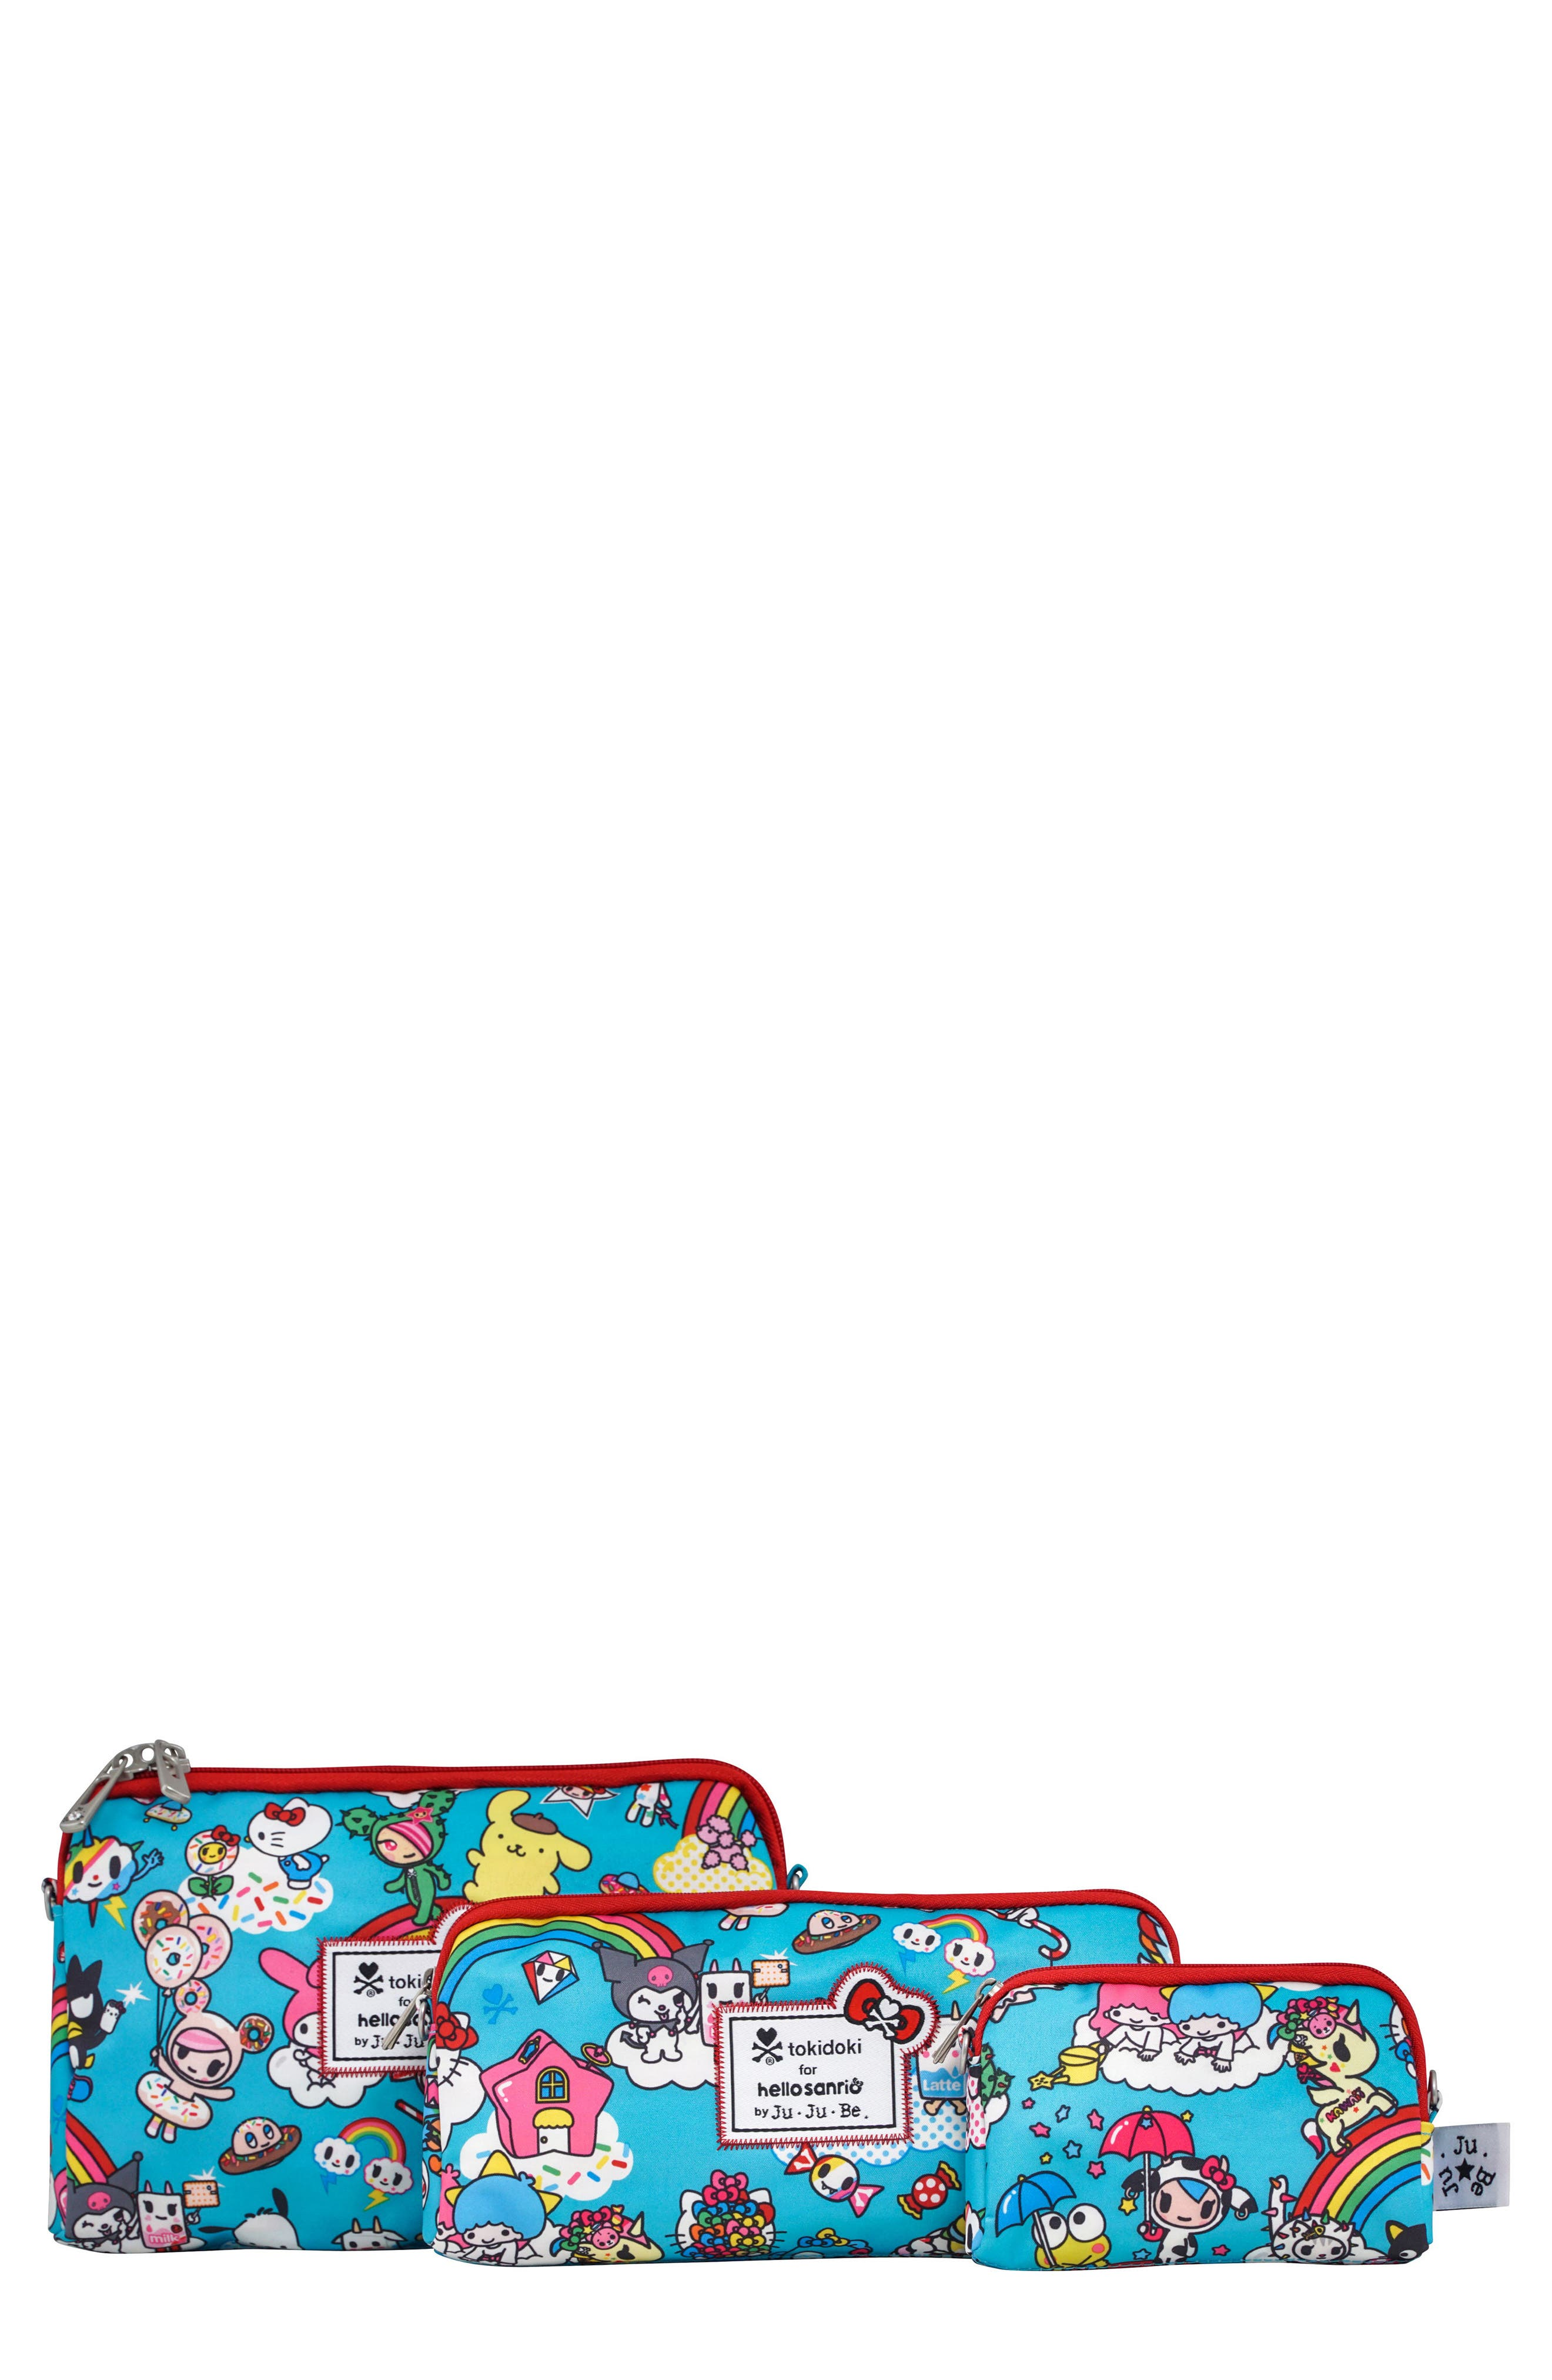 Main Image - Ju-Ju-Be x tokidoki for Hello Sanrio Rainbow Dreams Be Organized Set of 3 Top Zip Cases